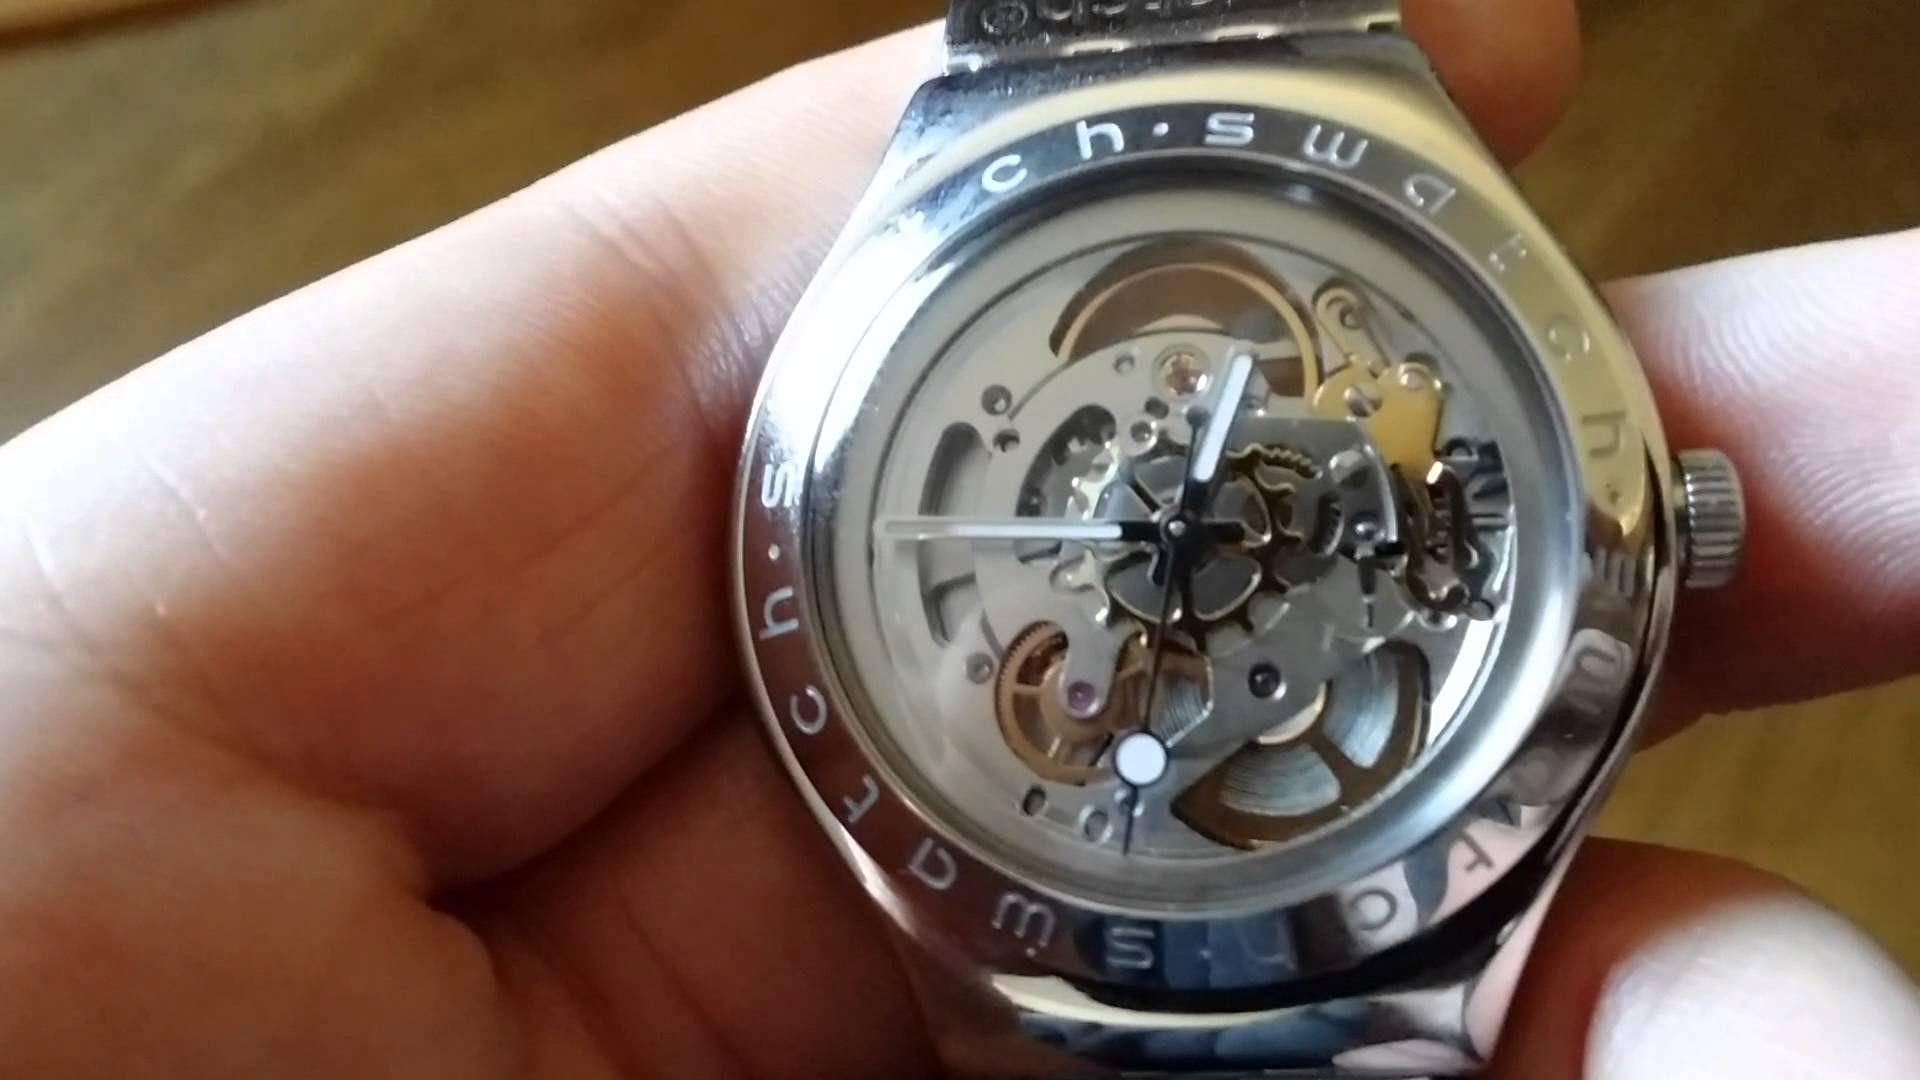 Swatch Irony Swiss 21 Jewel Automatic Movement Watches